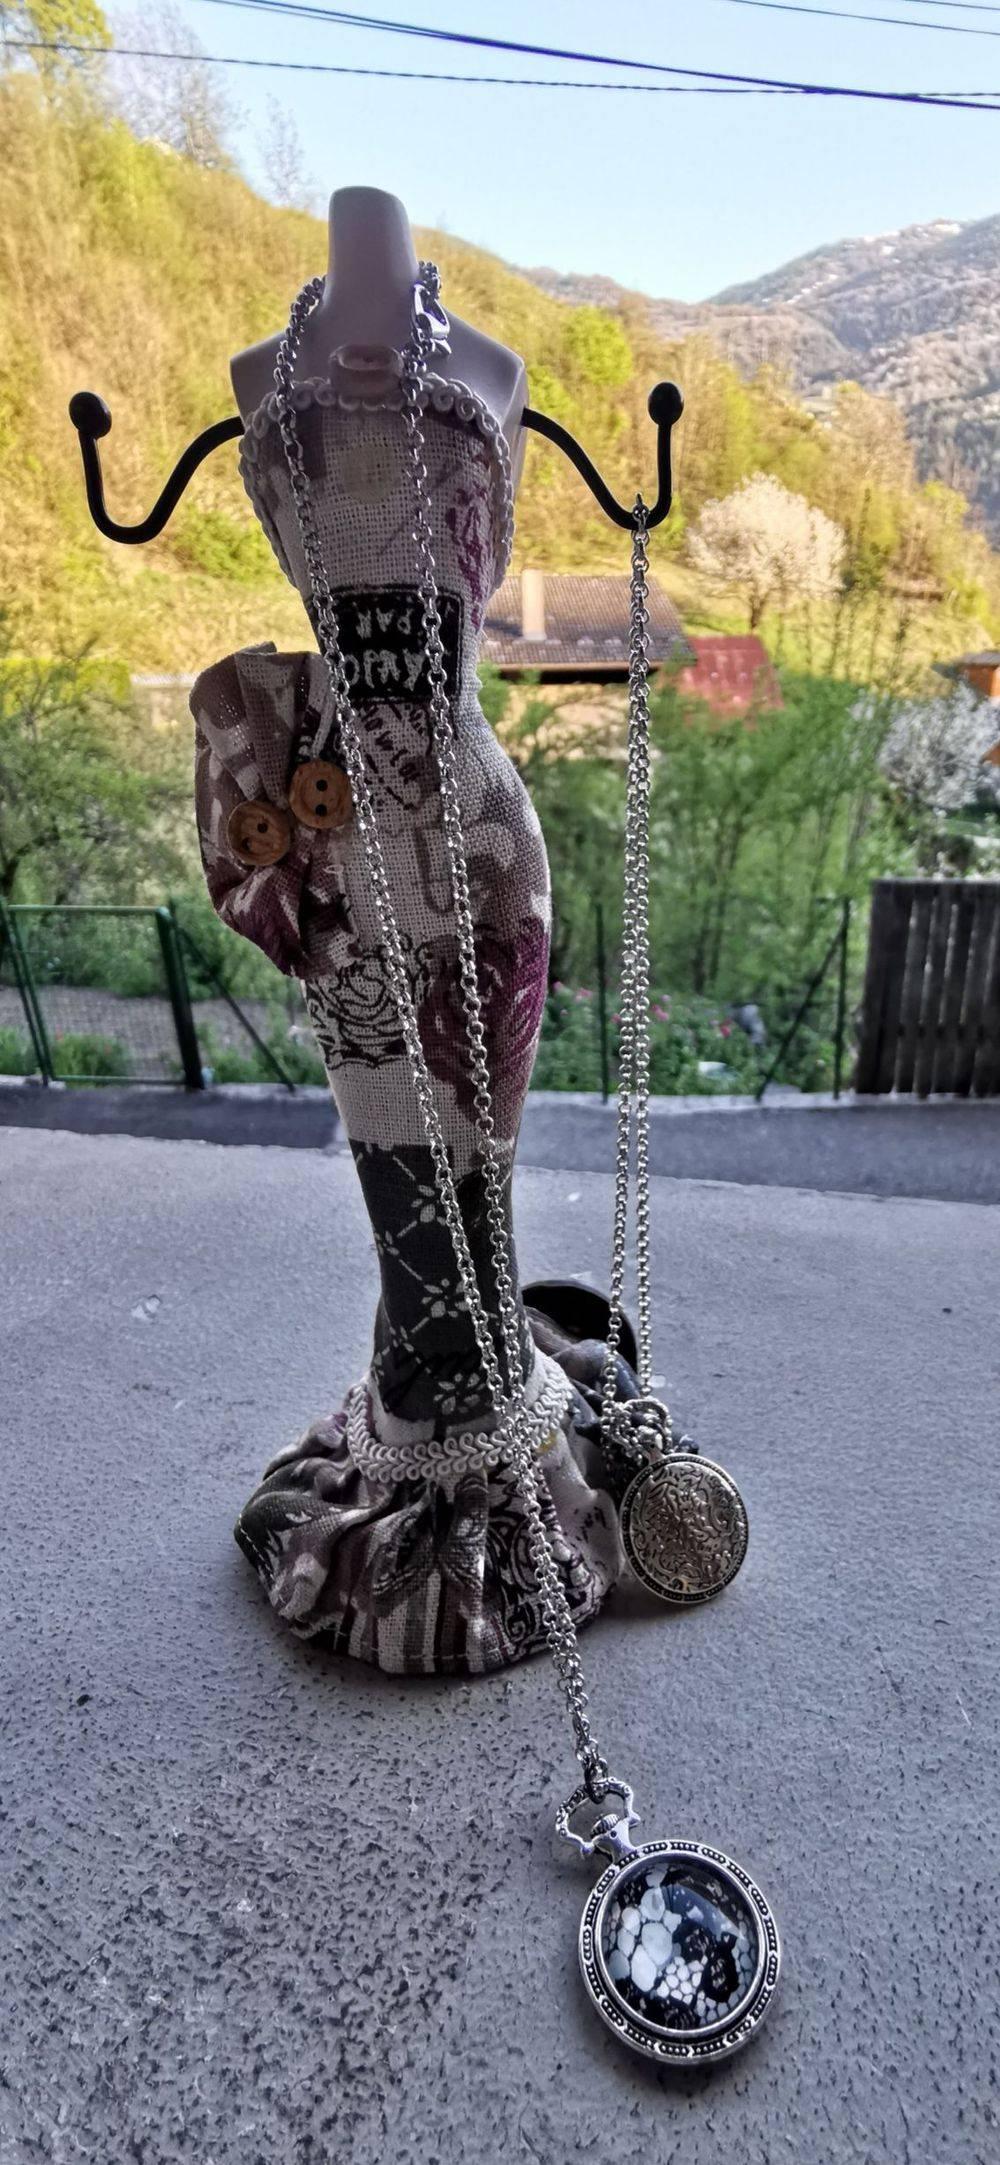 Collier tête de mort, collier rock, Skull'n'Roses, boucles d'oreilles rock, , Bijoux rock, bijoux crâne, bijoux tête de mort, bijoux Biker, bijoux rockabilly, bijoux pinup, Skull, crâne, tête de mort, bijoux artisanaux, Rock'n'Babe, rocknbabe, rocknbabeshop